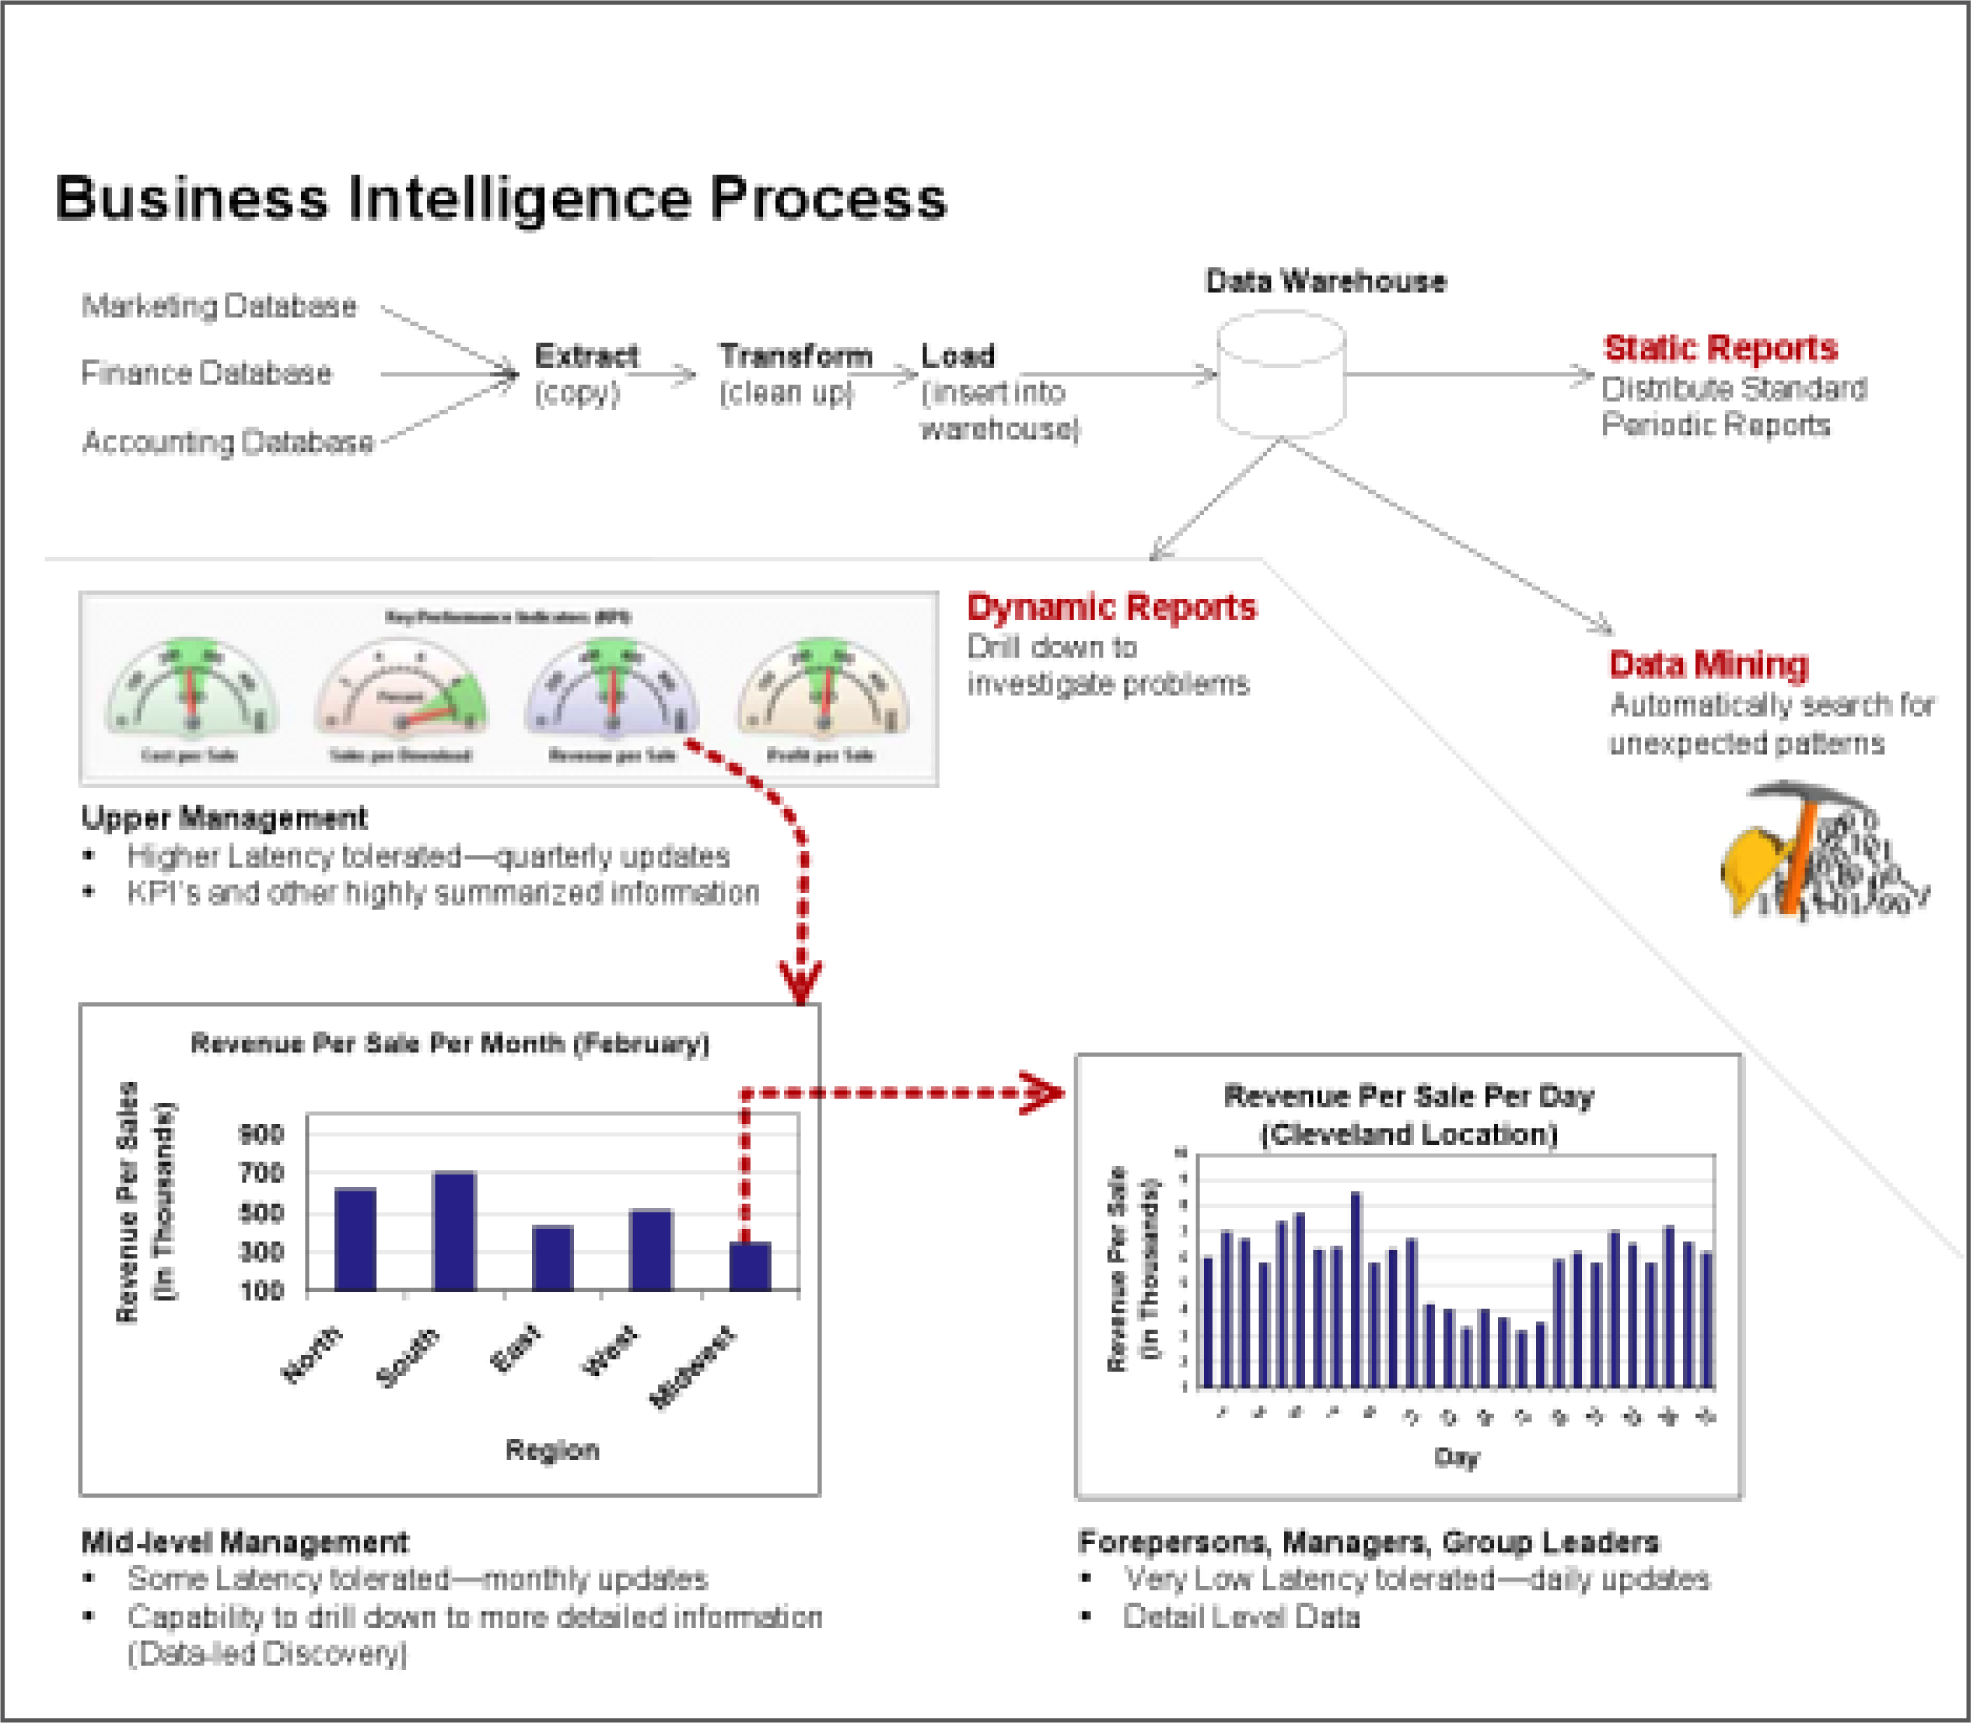 Business Intelligence: Analysis of App Sales Data